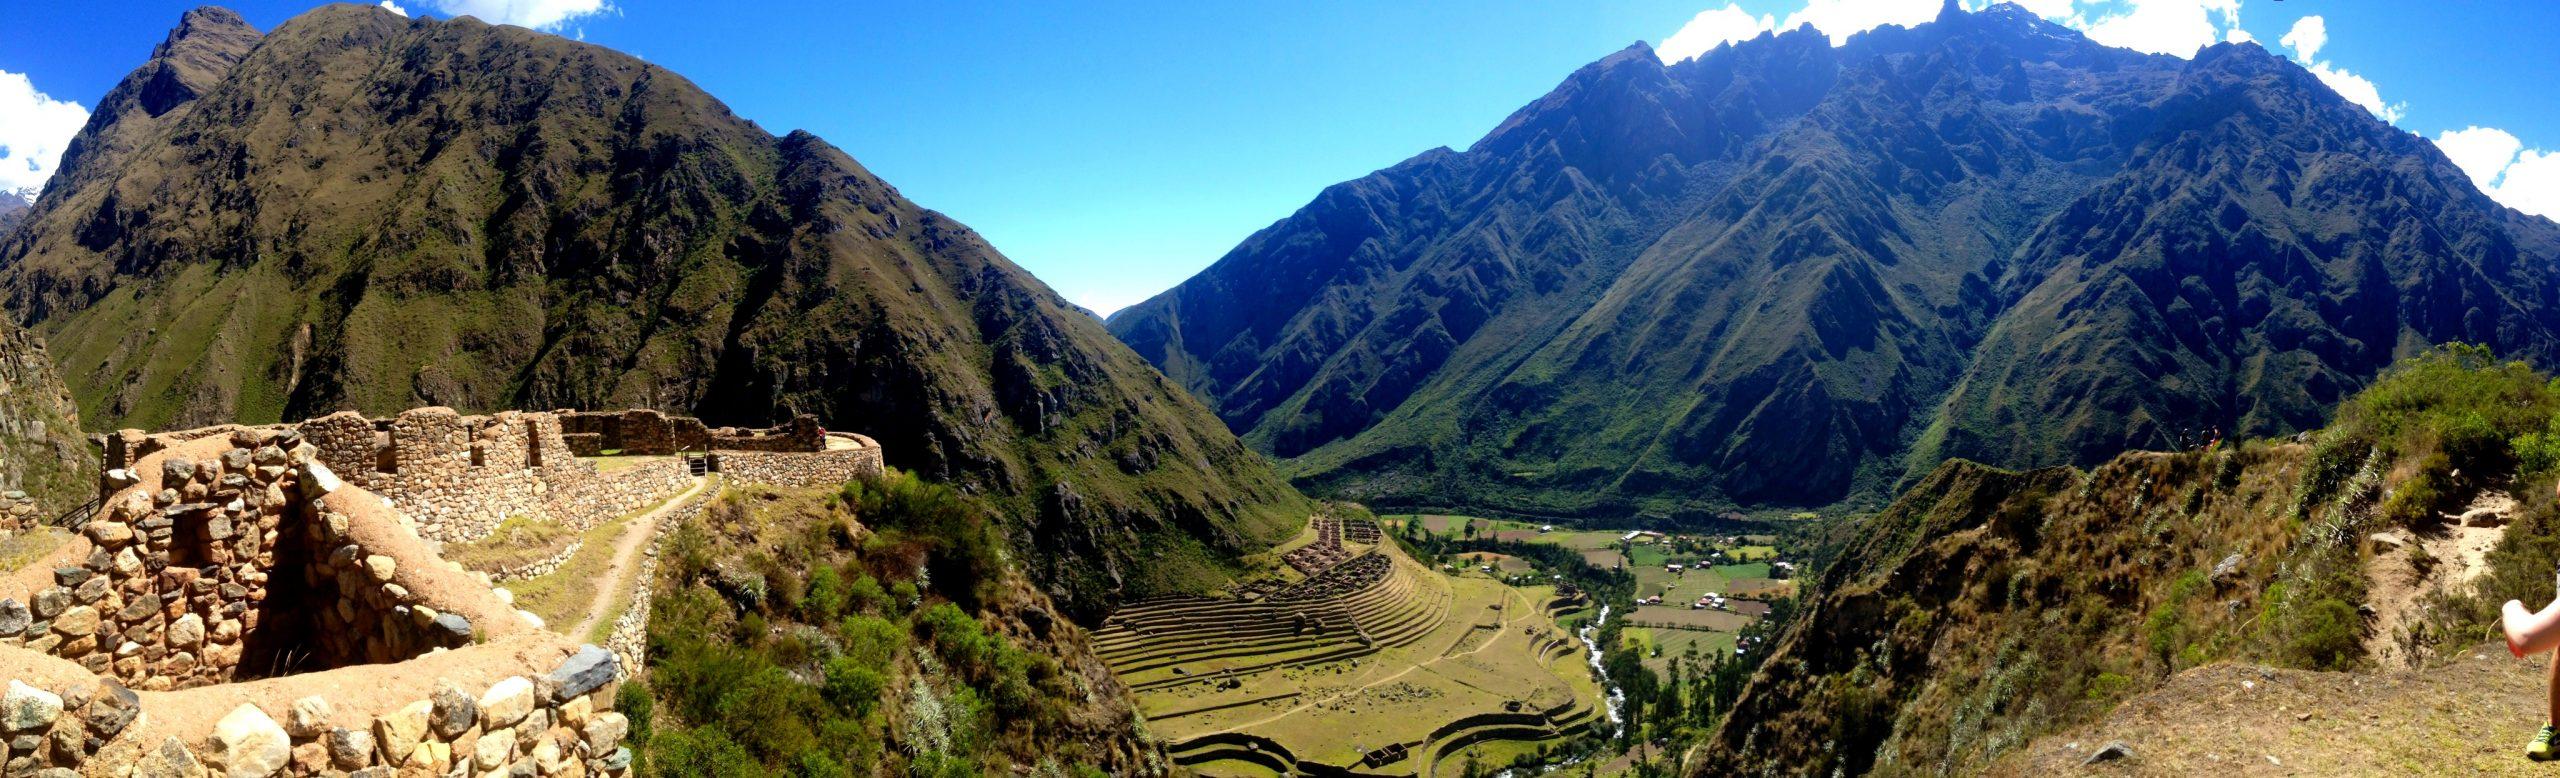 Inca Trail or Salkantay Trek